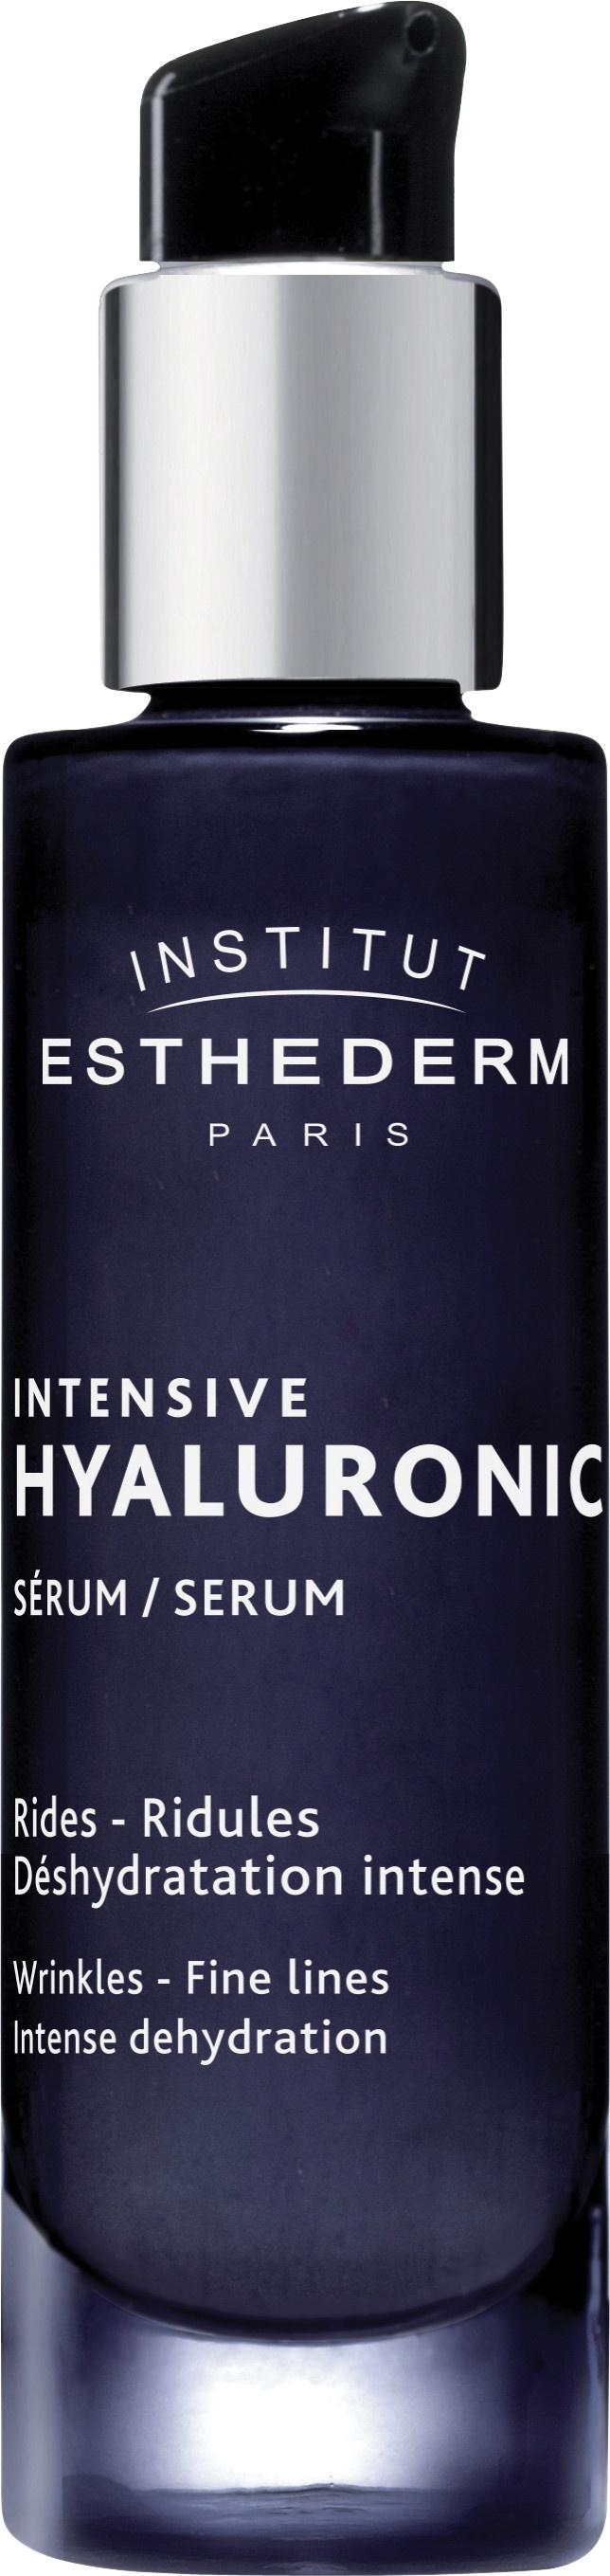 Institut Esthederm Intensive Hyaluronic Sérum